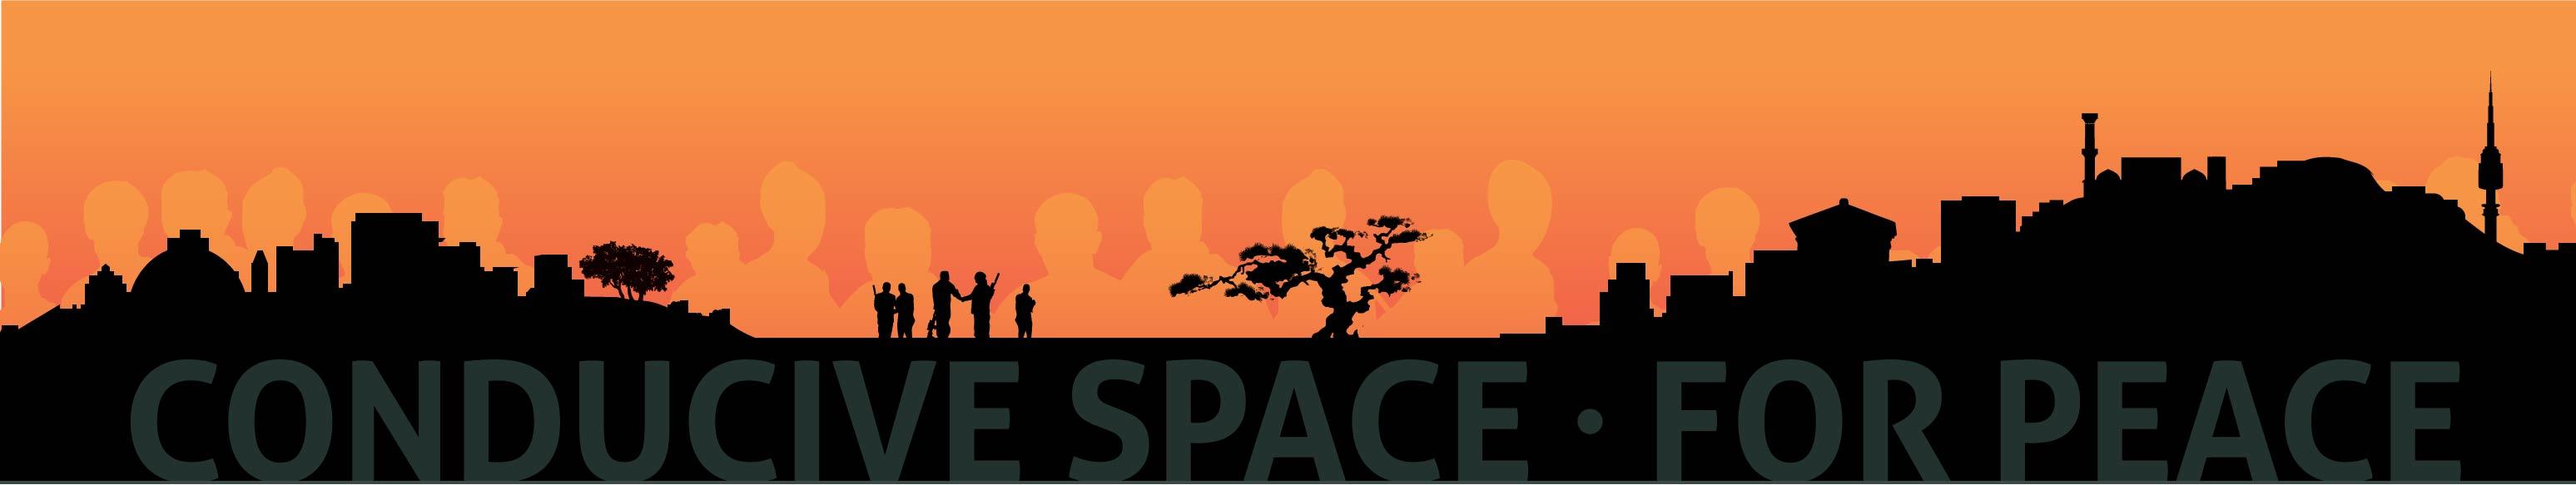 Peace Building Project